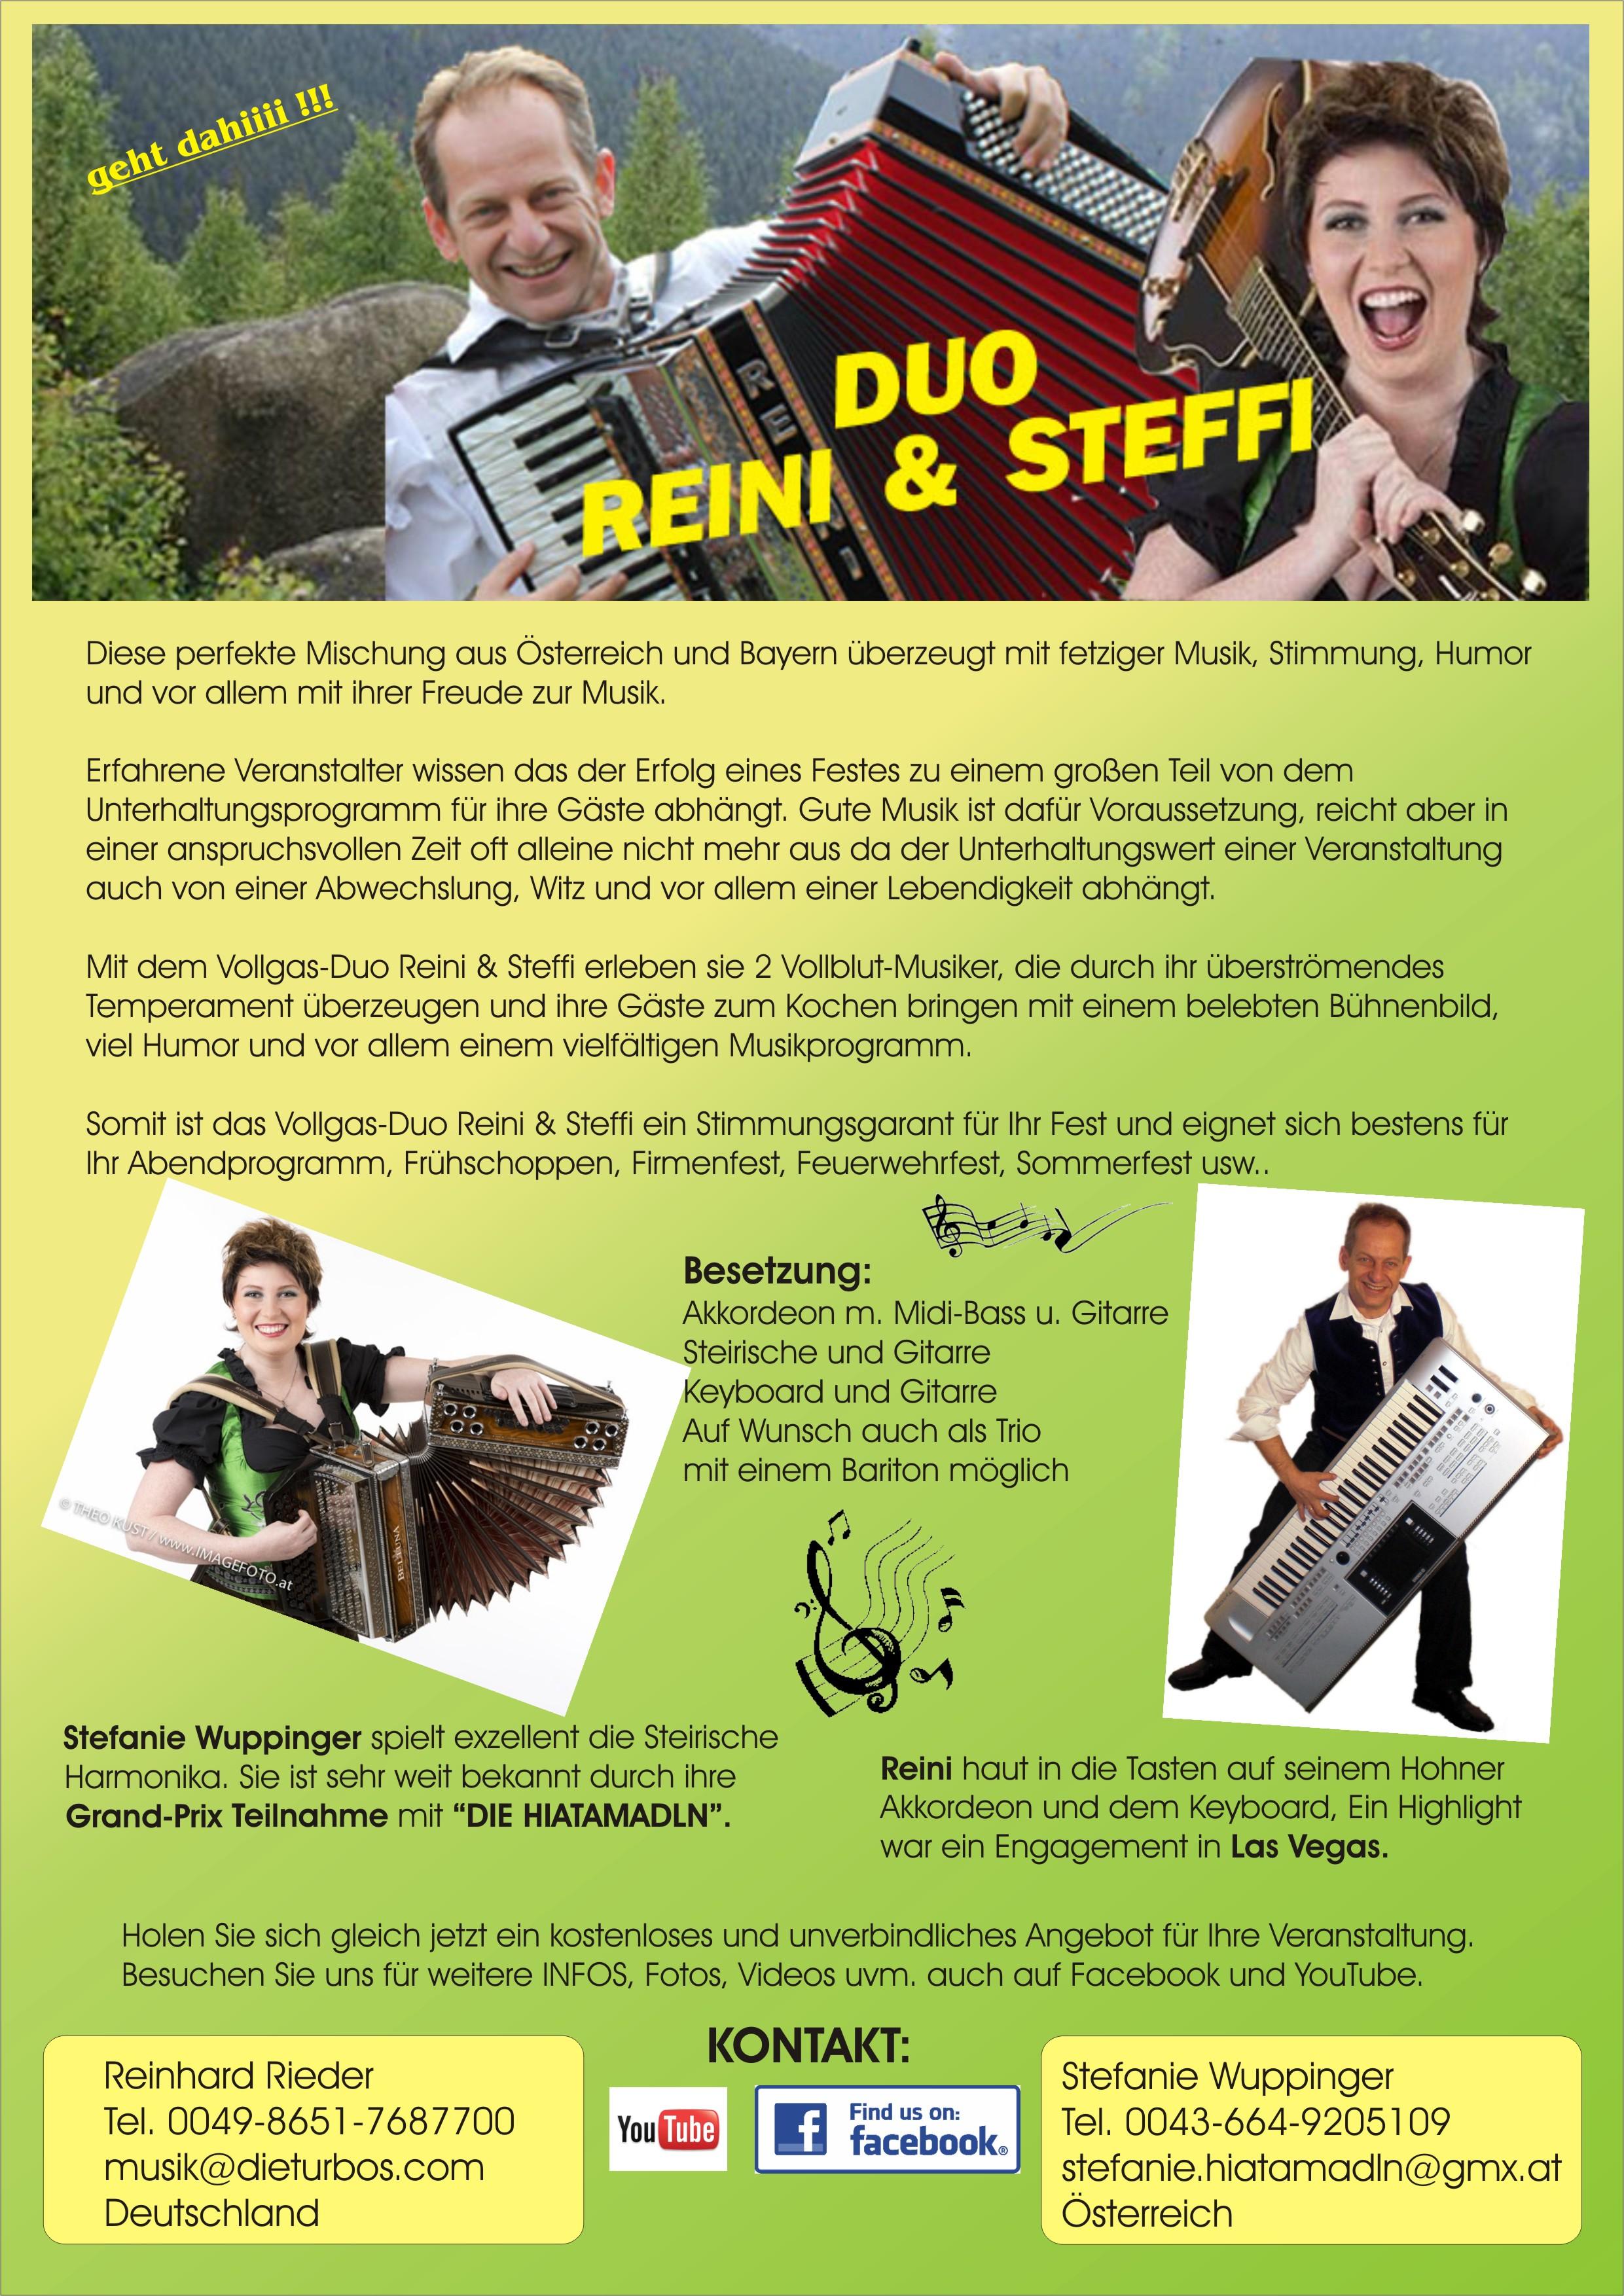 Reini & Steffi das Vollgas-Duo